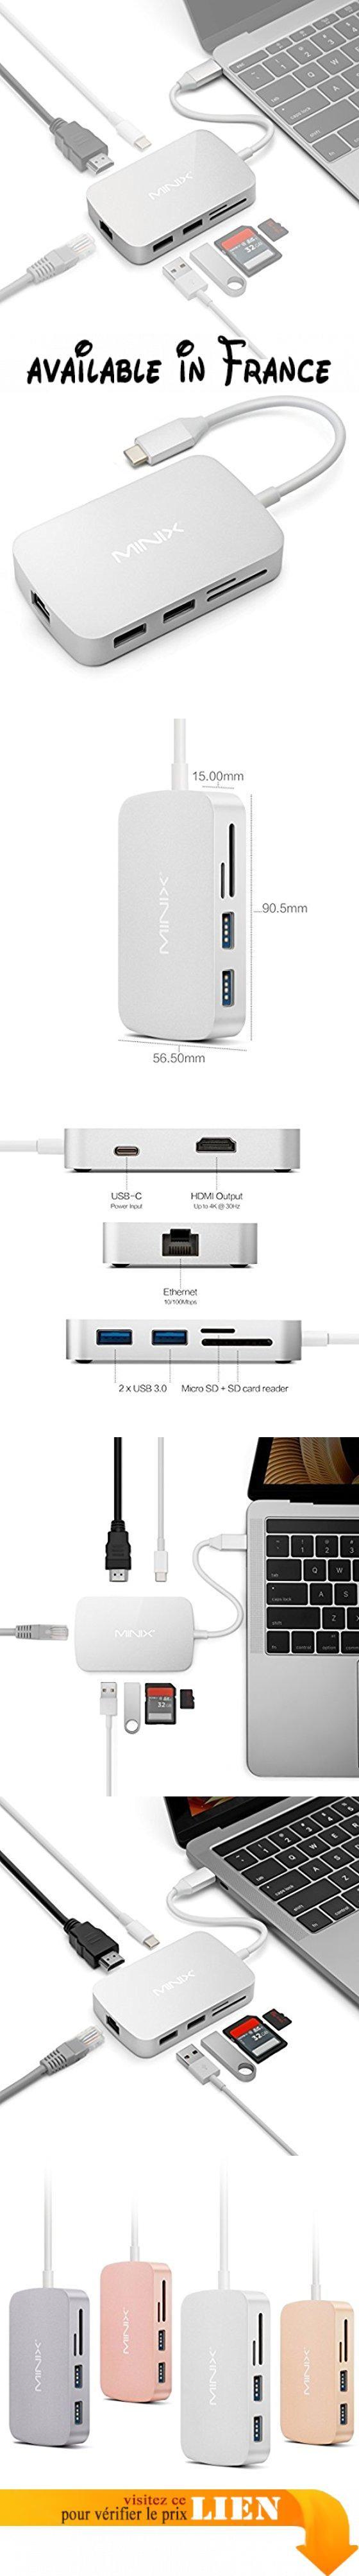 C¢bles MINIX NEO C X 7 en 1 USB Type C vers 2 x USB 3 0 HDMI